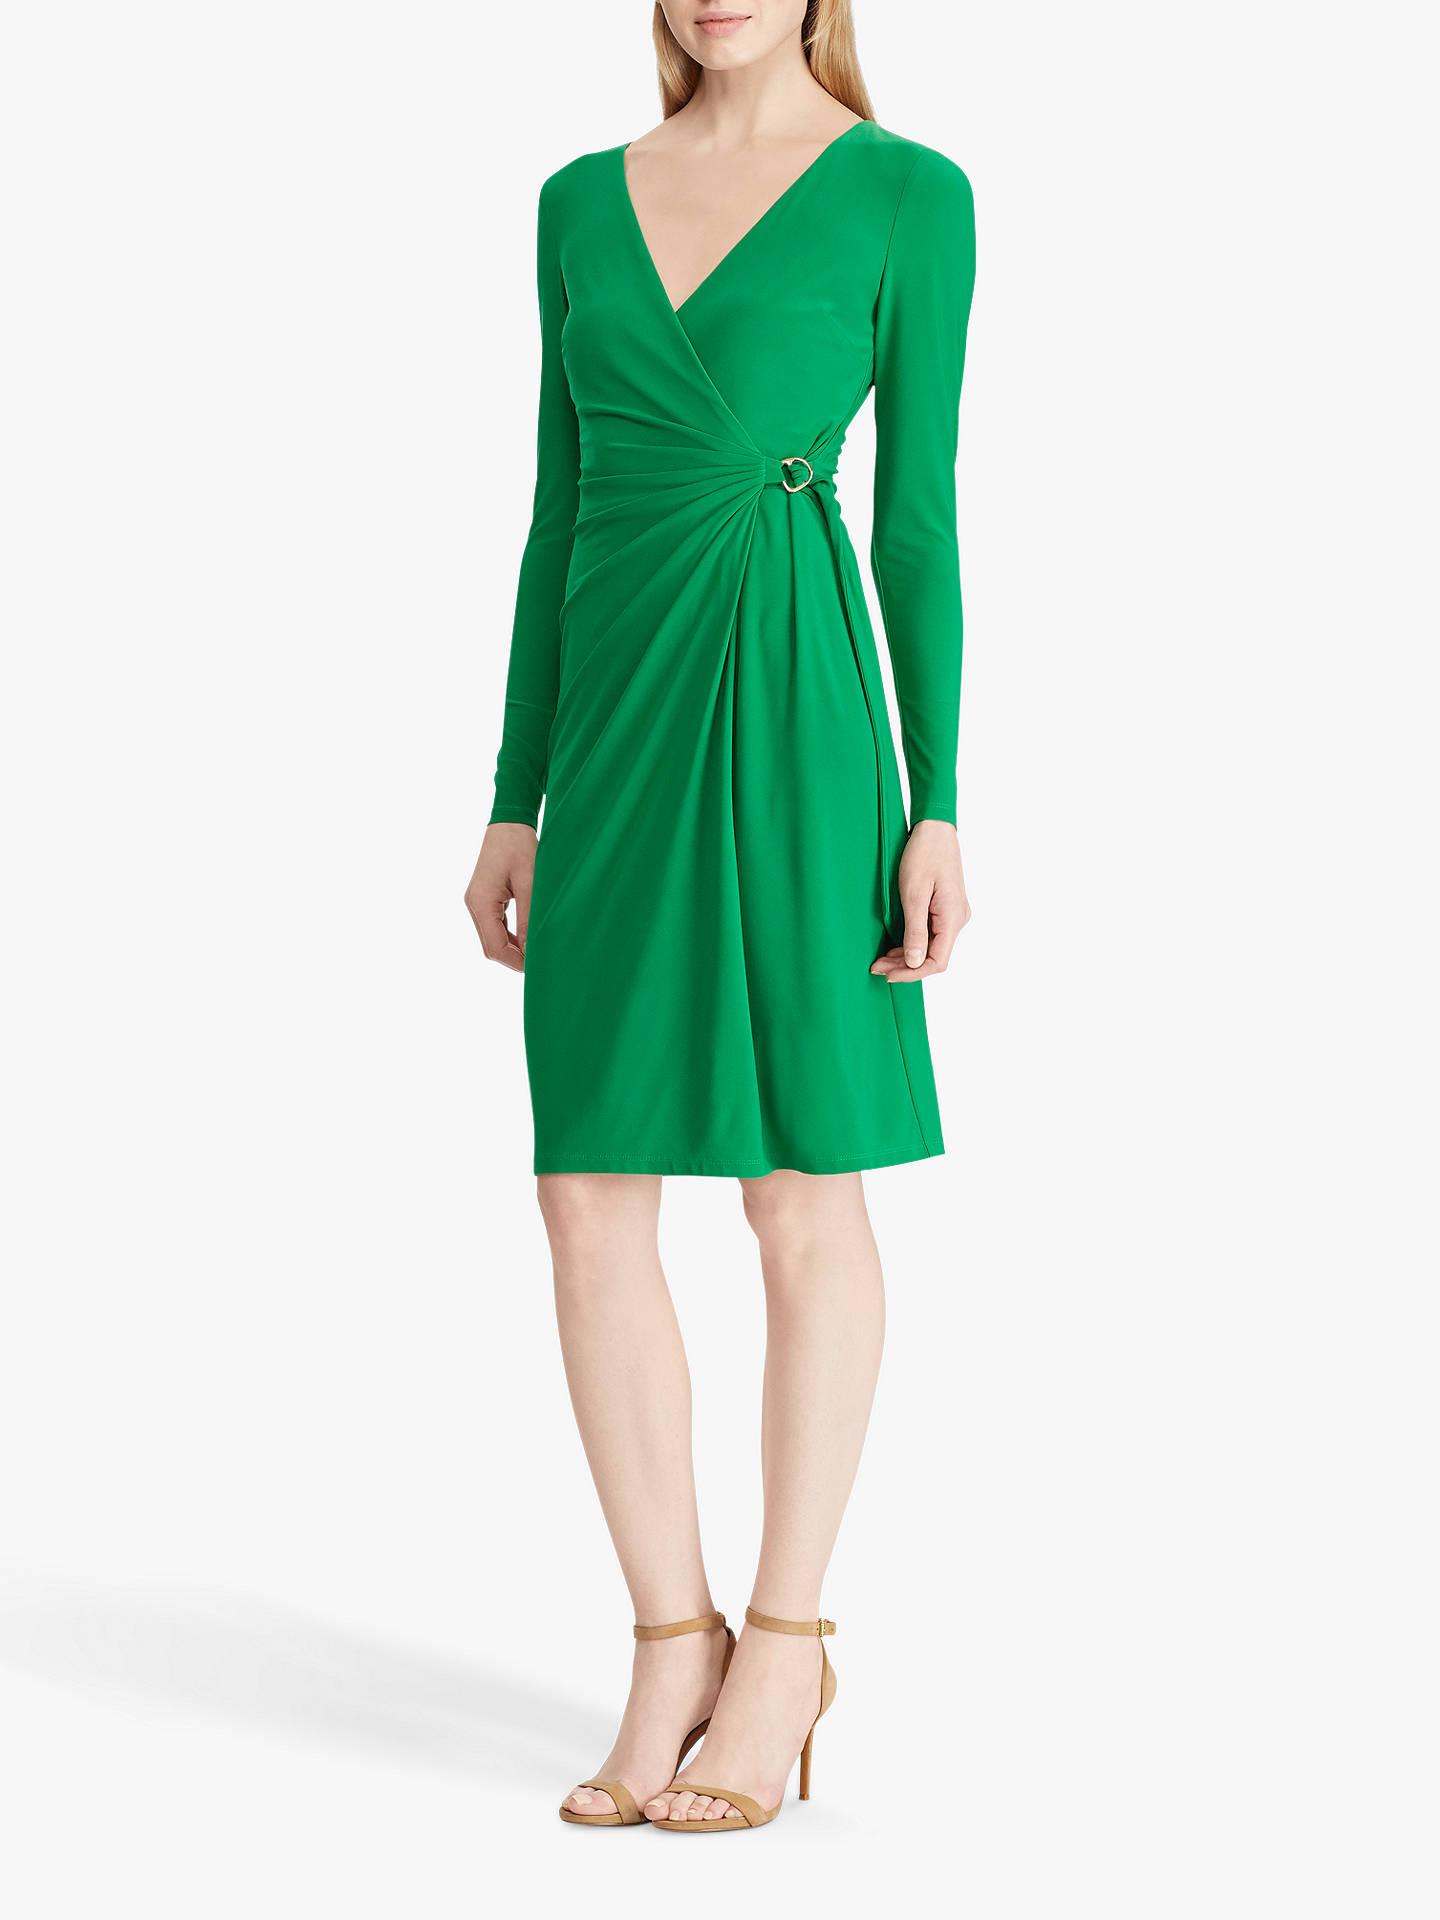 637f27cde30 Buy Lauren Ralph Lauren Casondra Dress